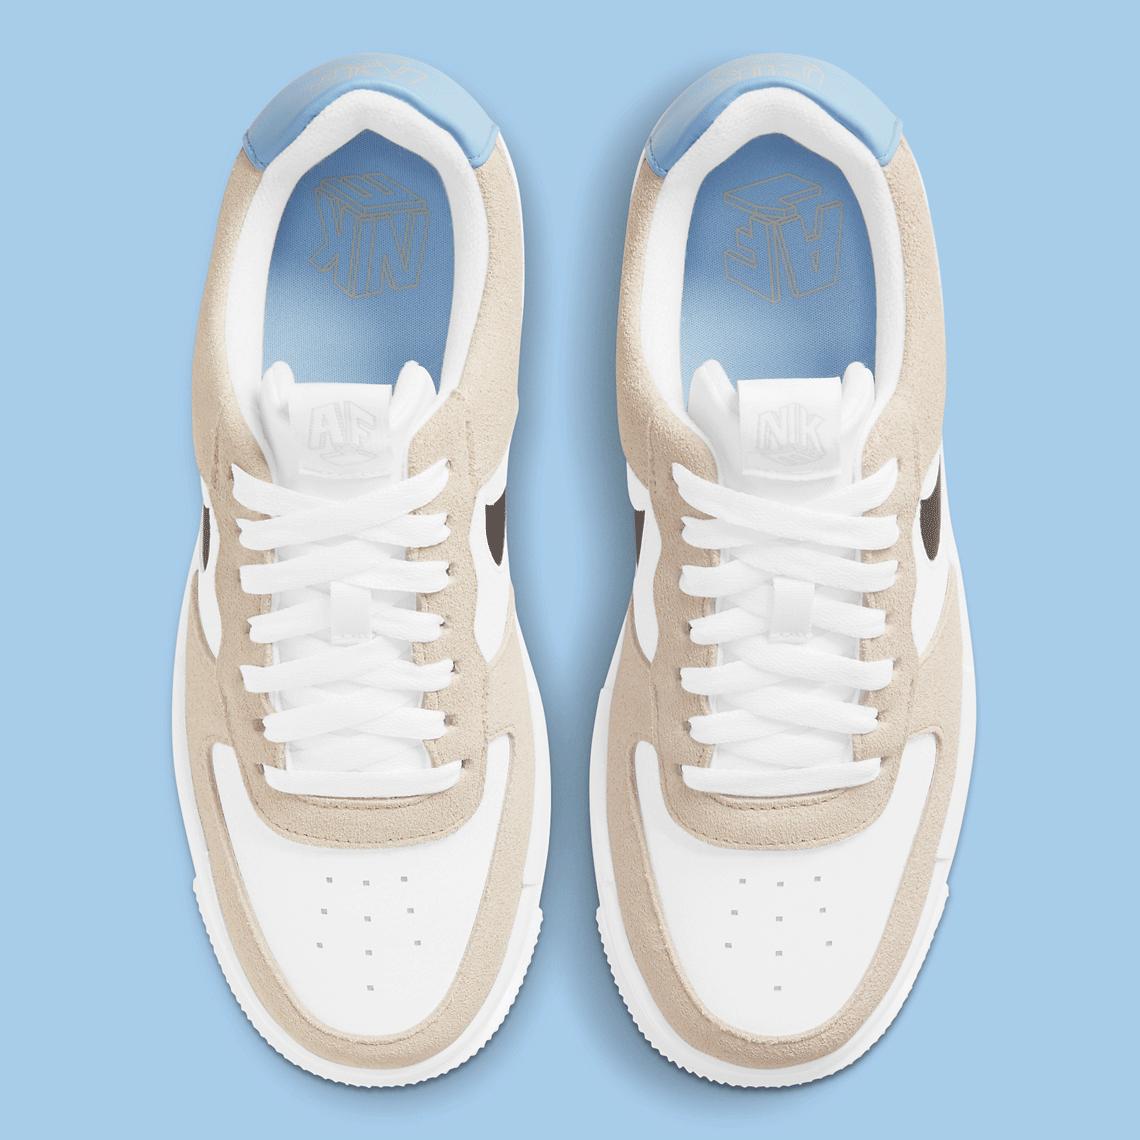 Nike Air Force 1 Pixel Desert Sand DH3861-001   SneakerNews.com